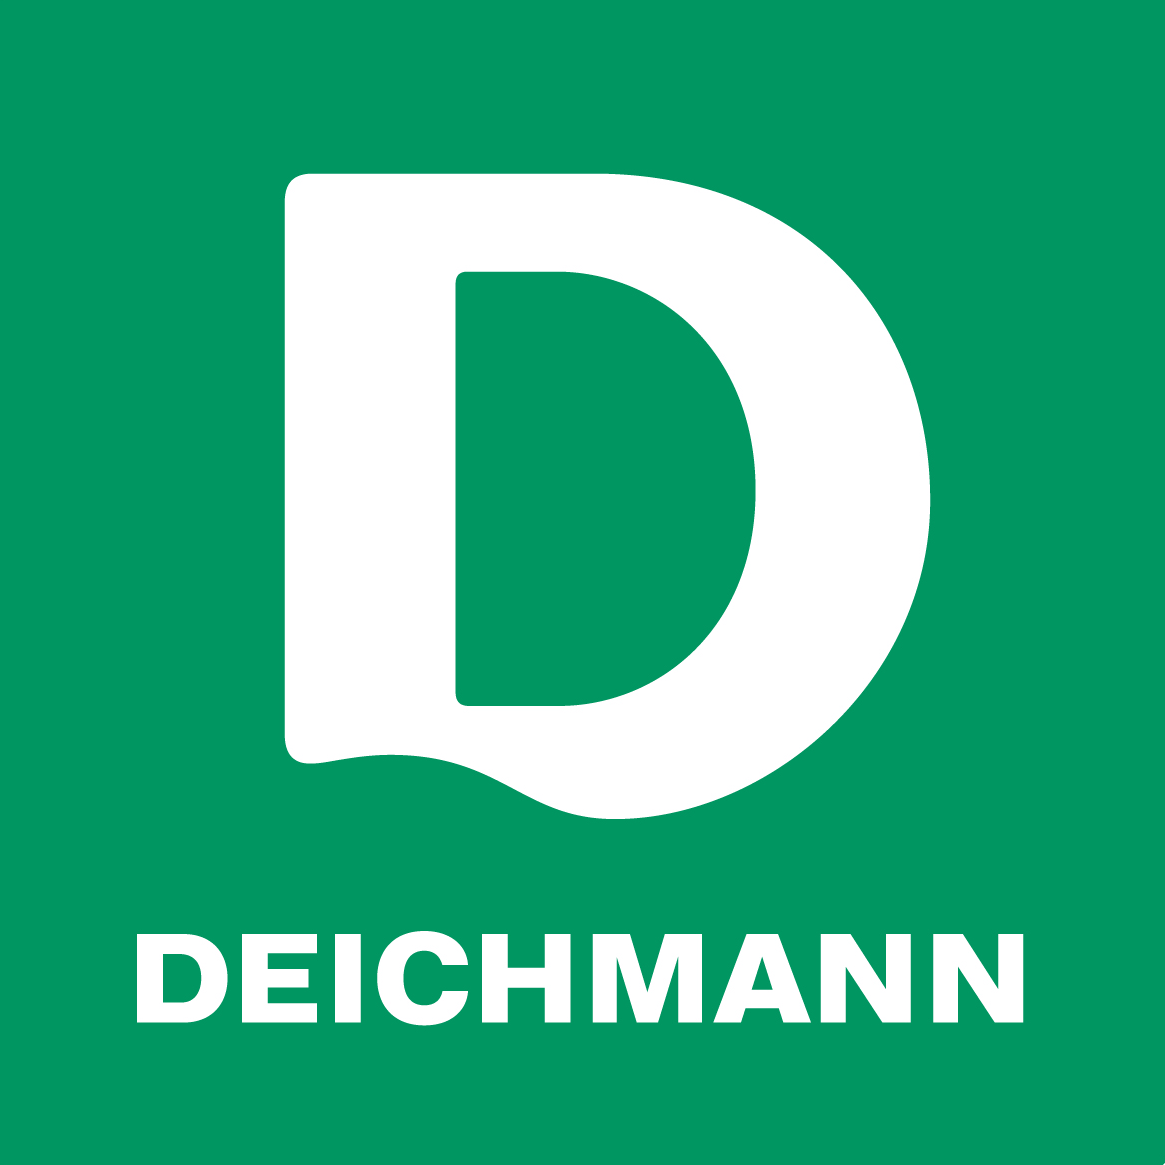 Daichman kod rabatowy